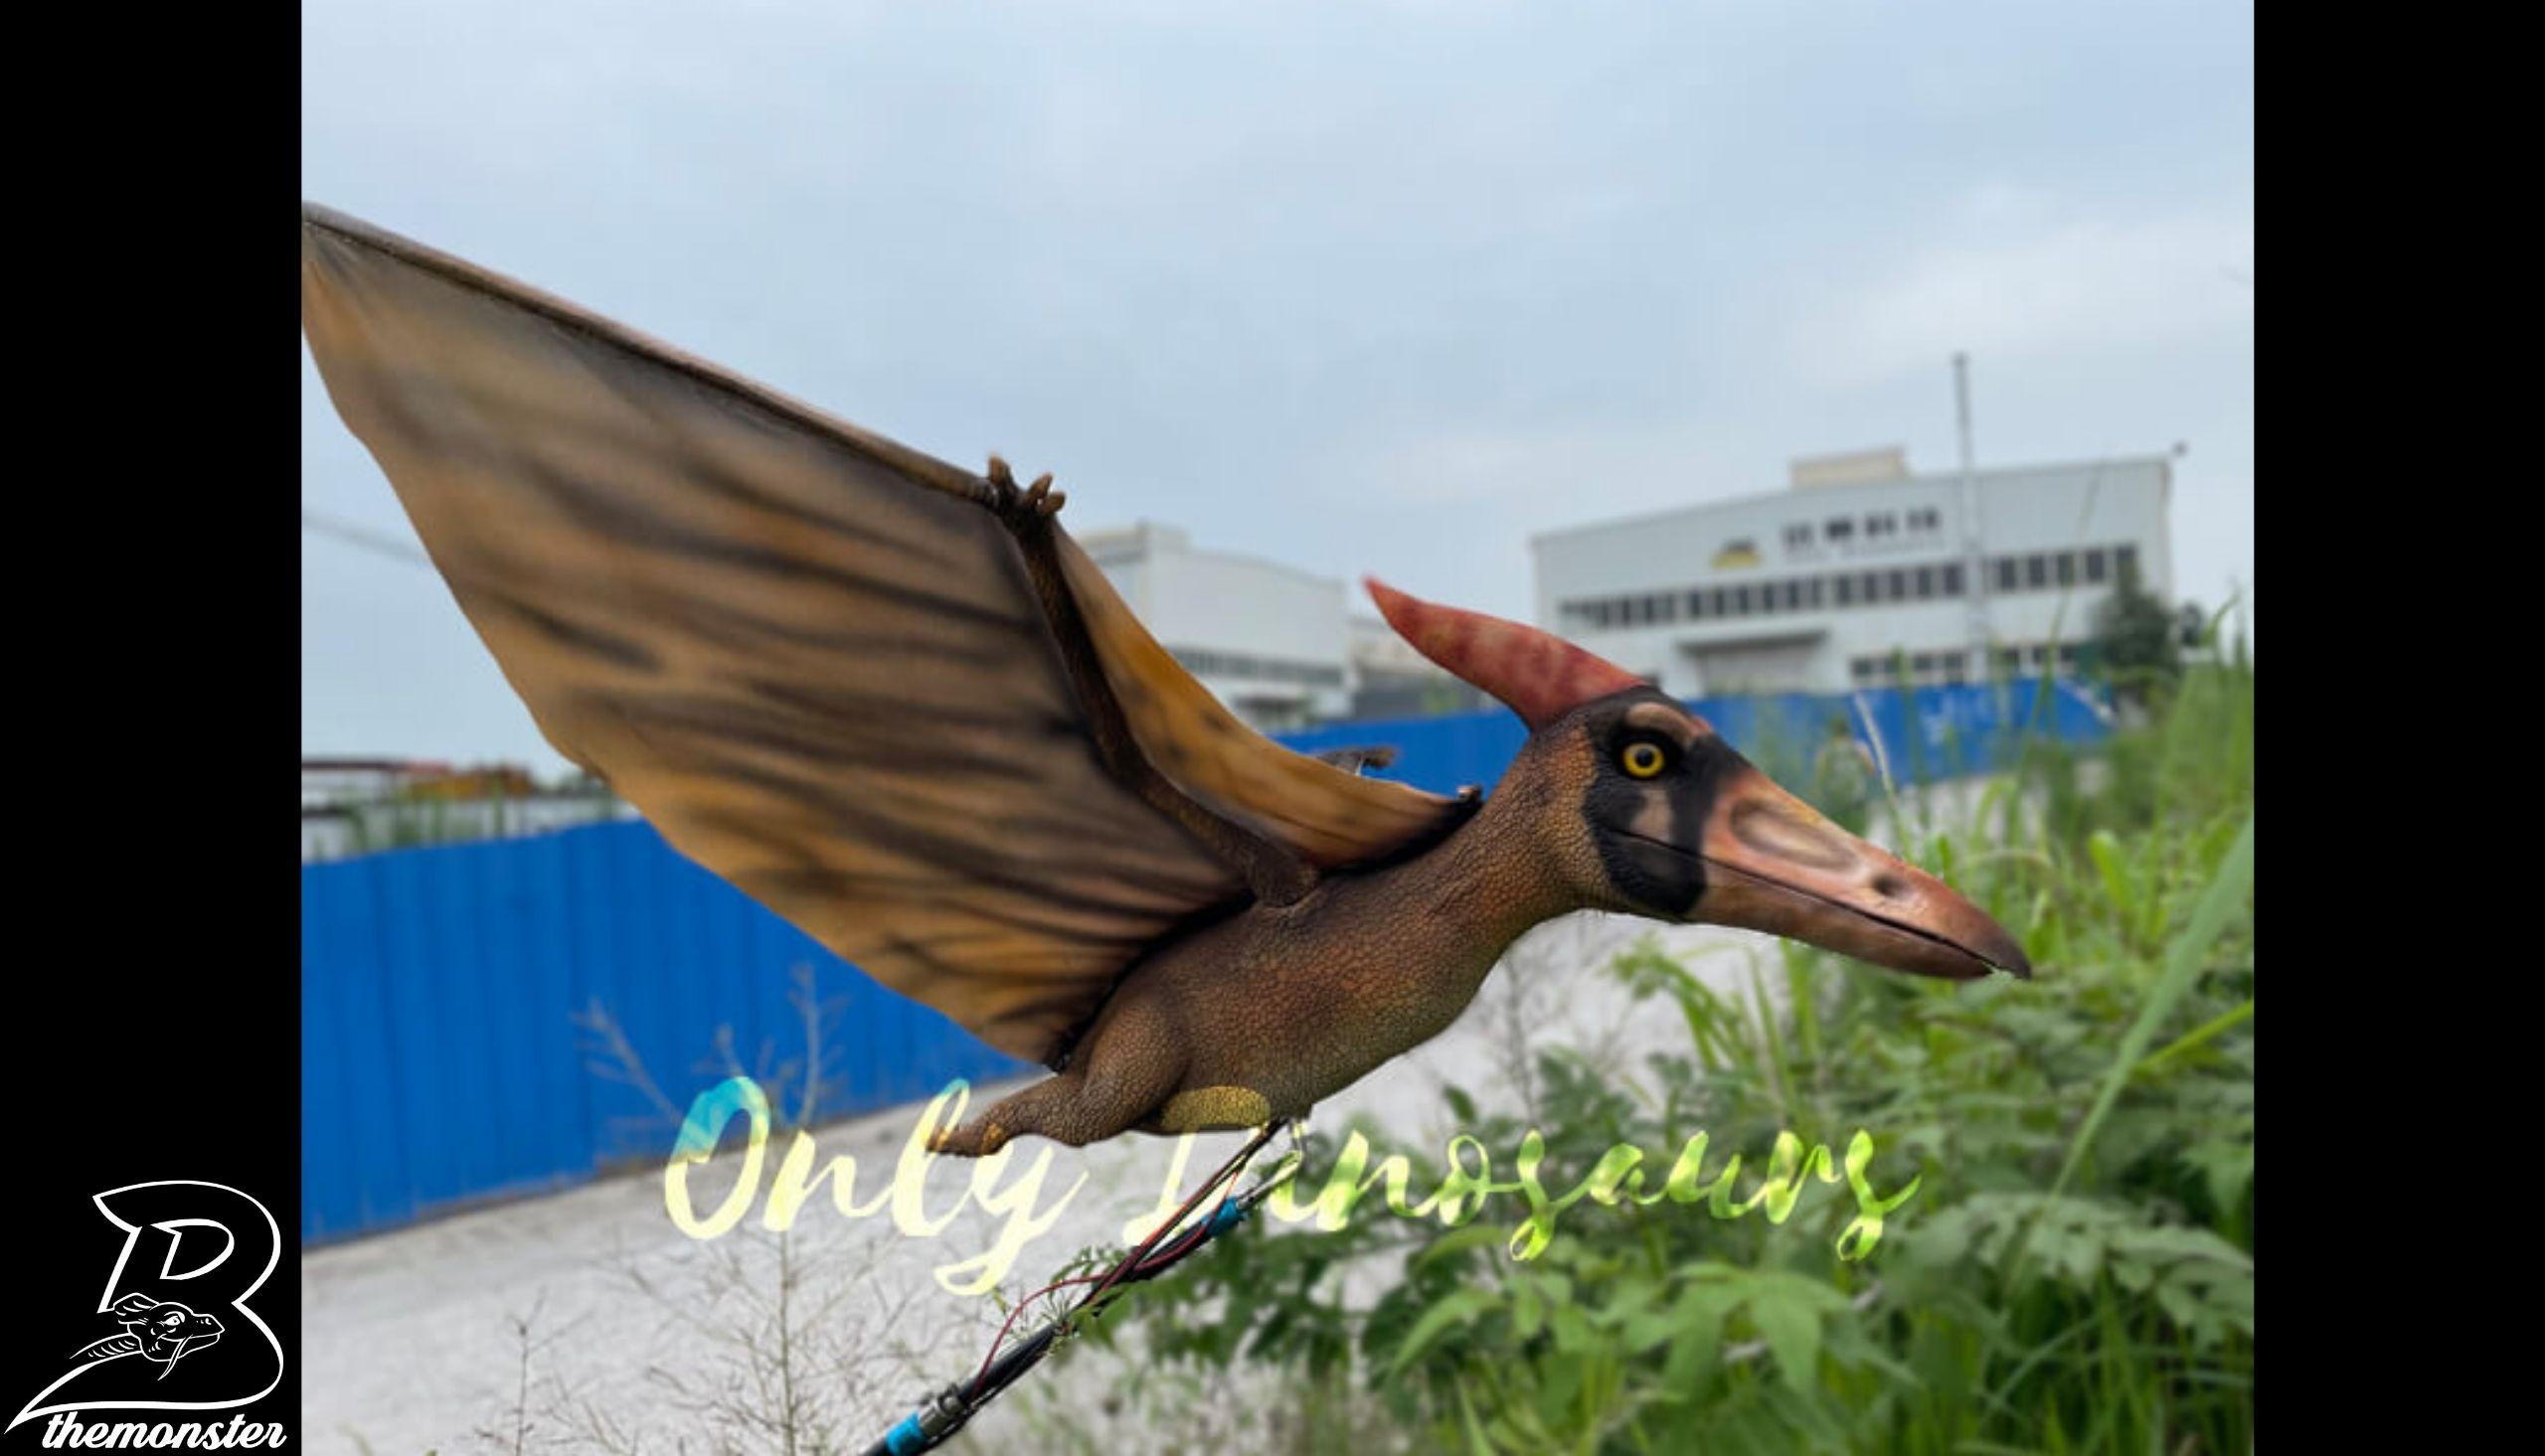 Custom Pterosaur Rod Puppet in vendita sul Bthemonster.com